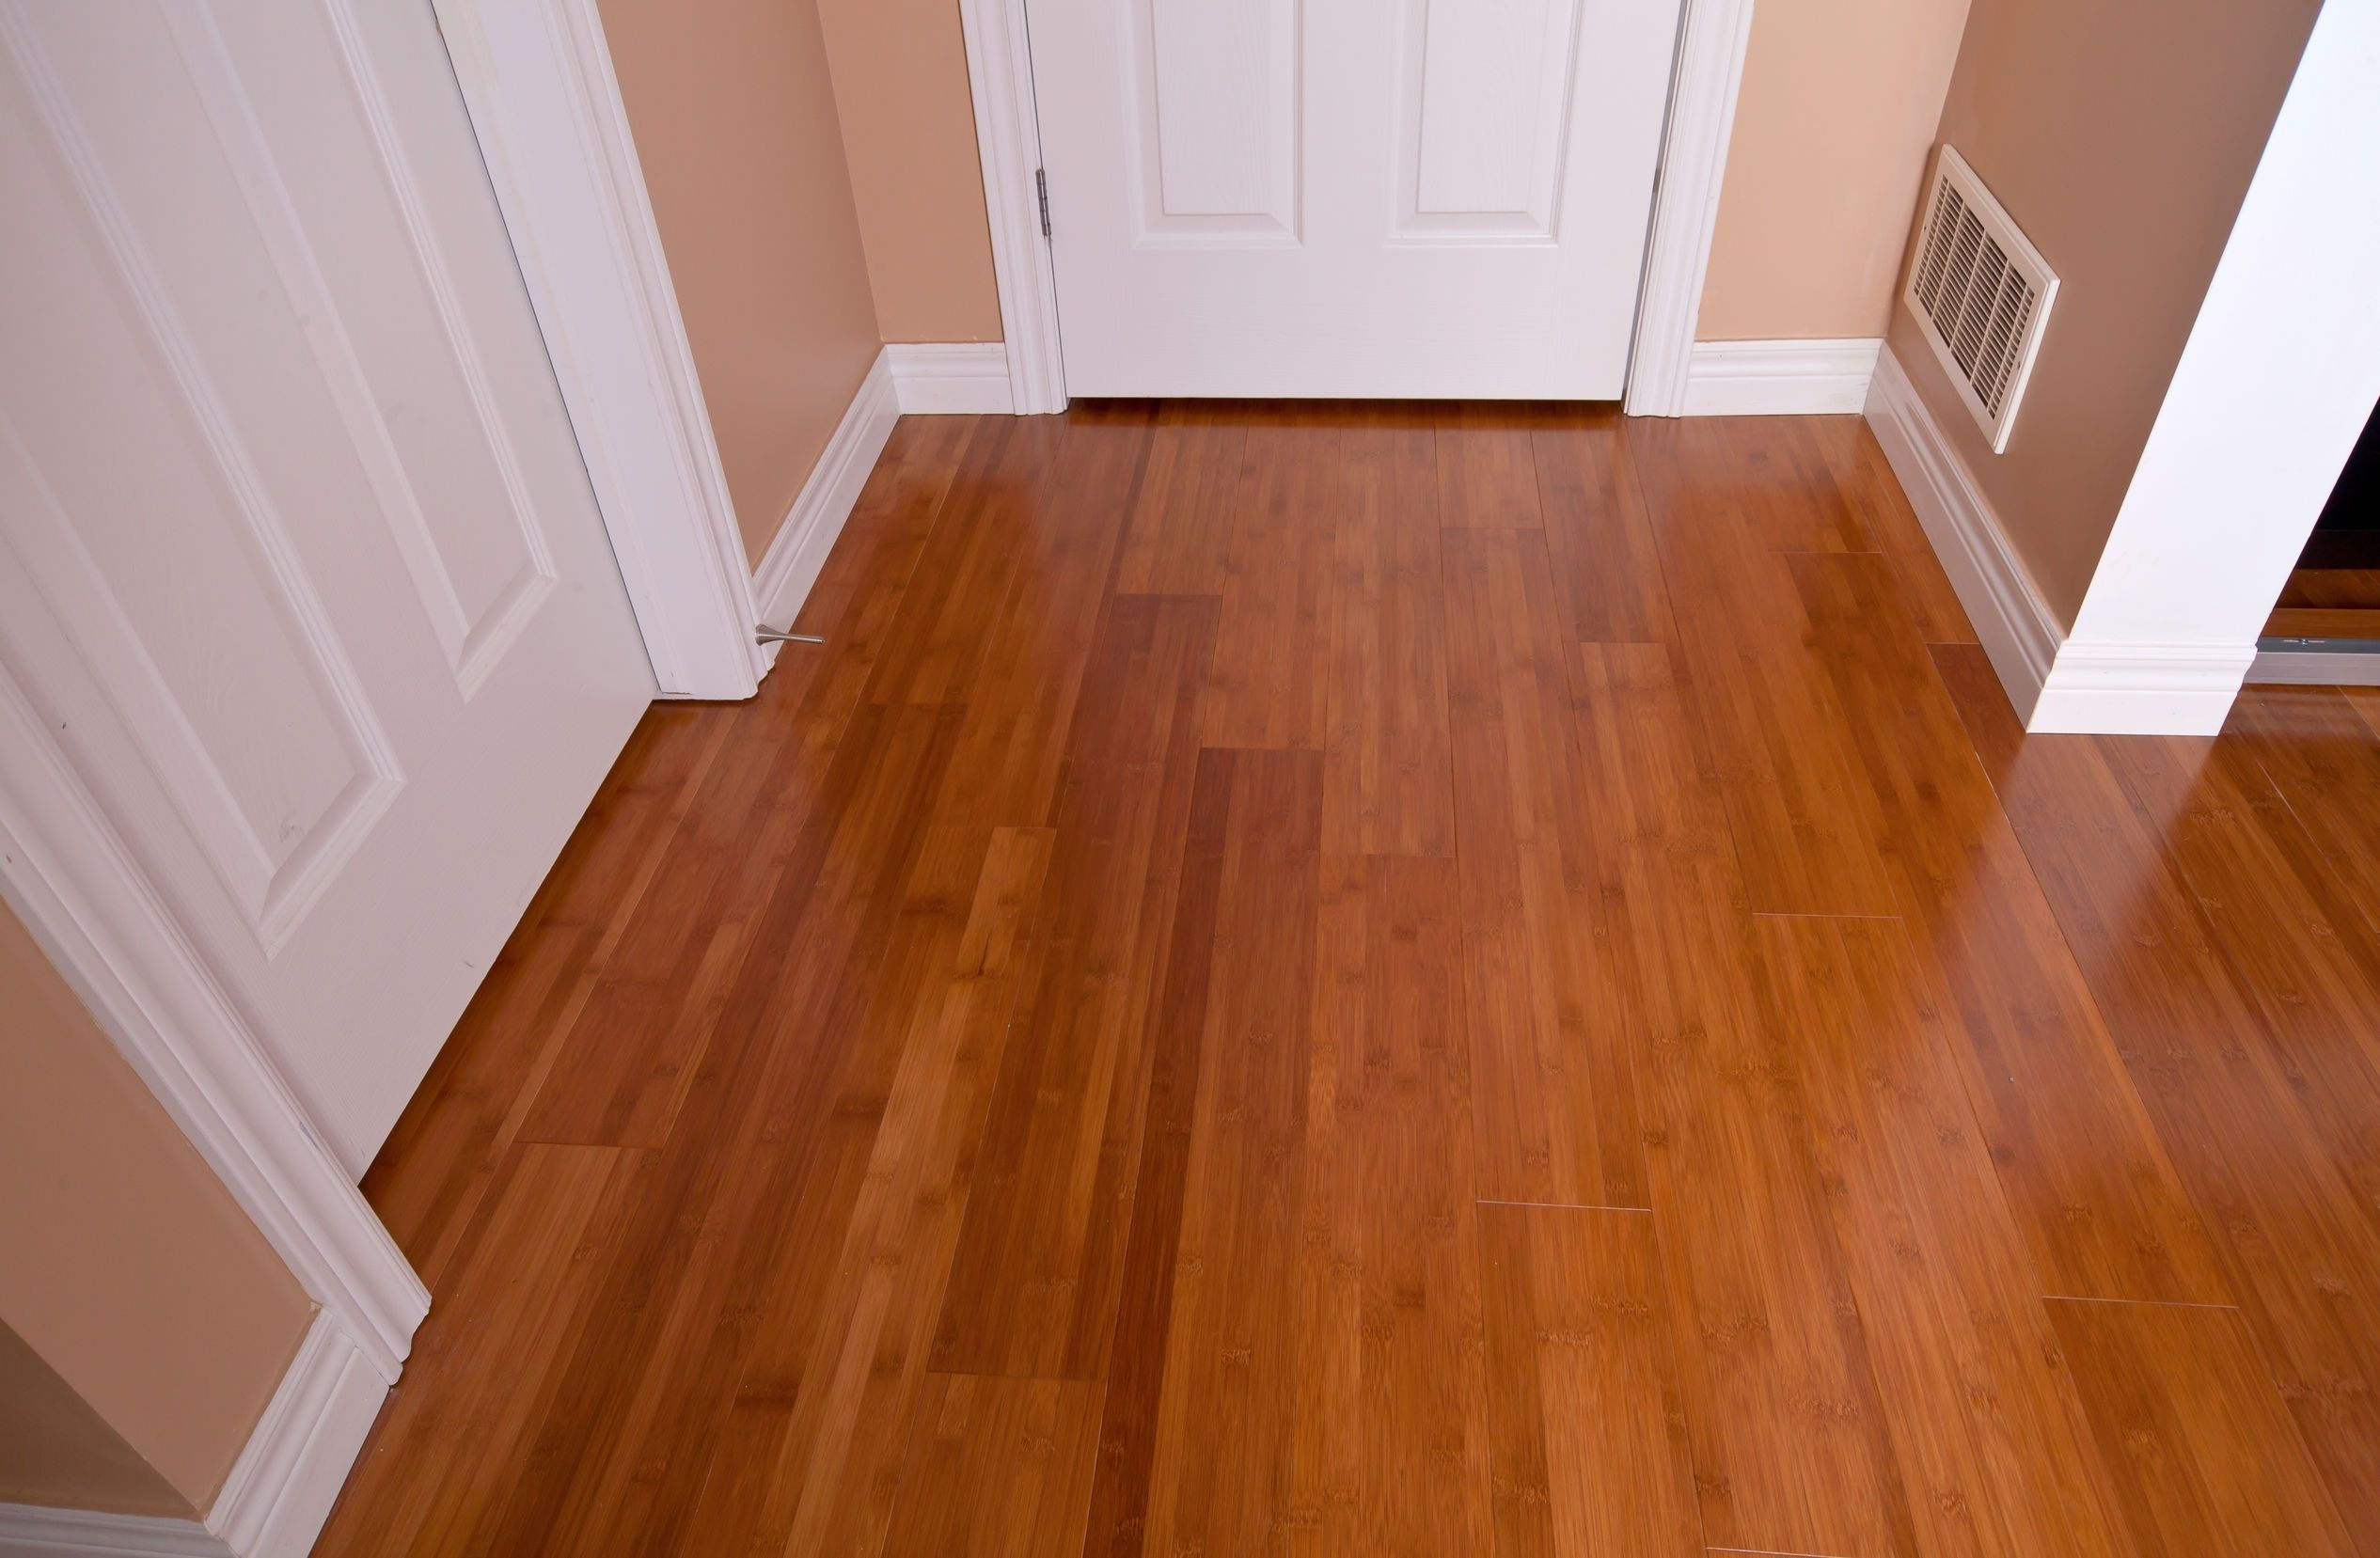 Hardwood versus laminate flooring the truth glblcom